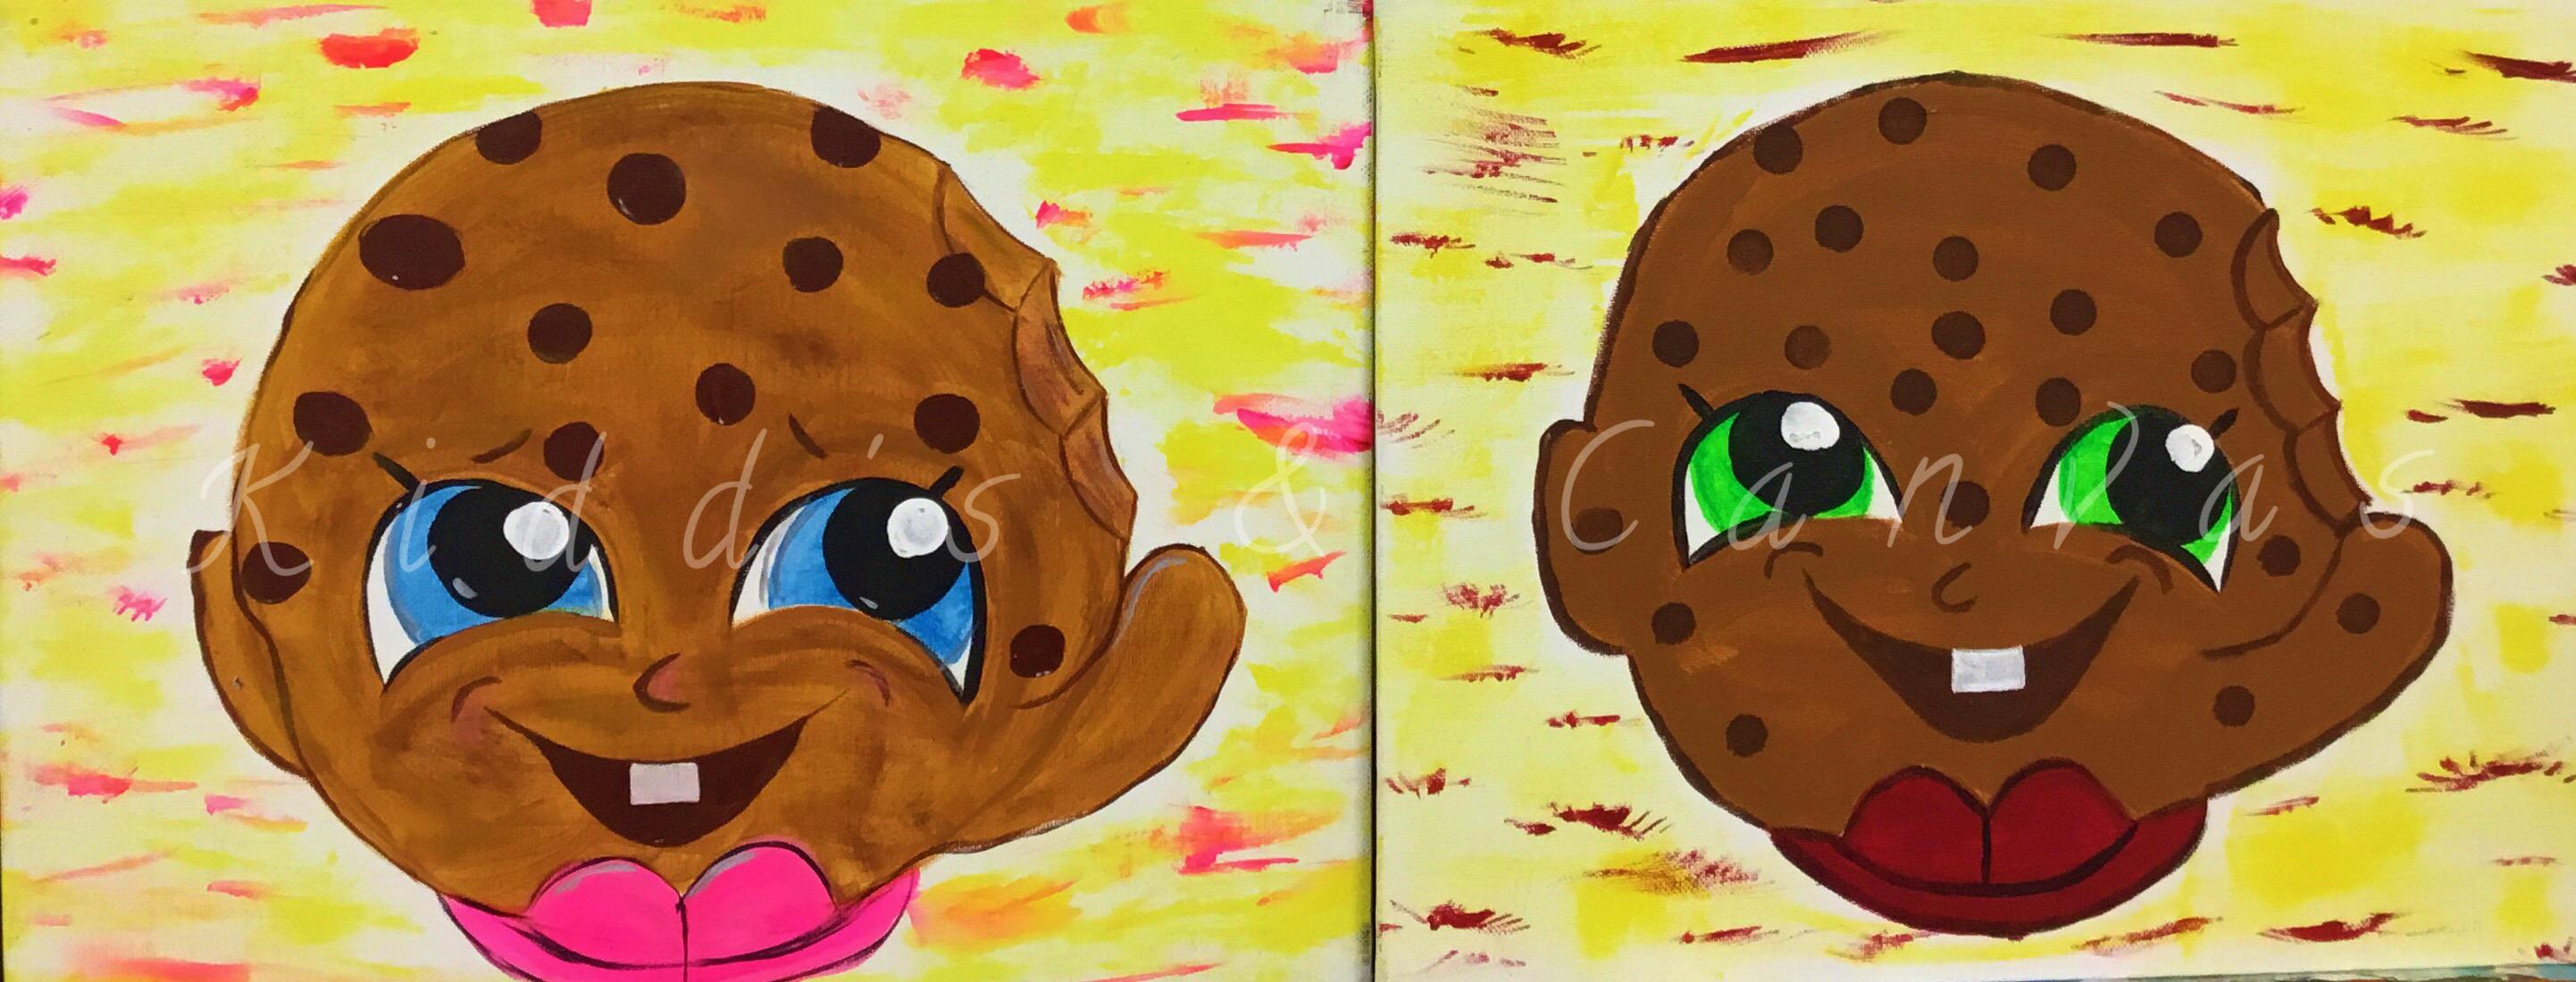 Cooky Cookie